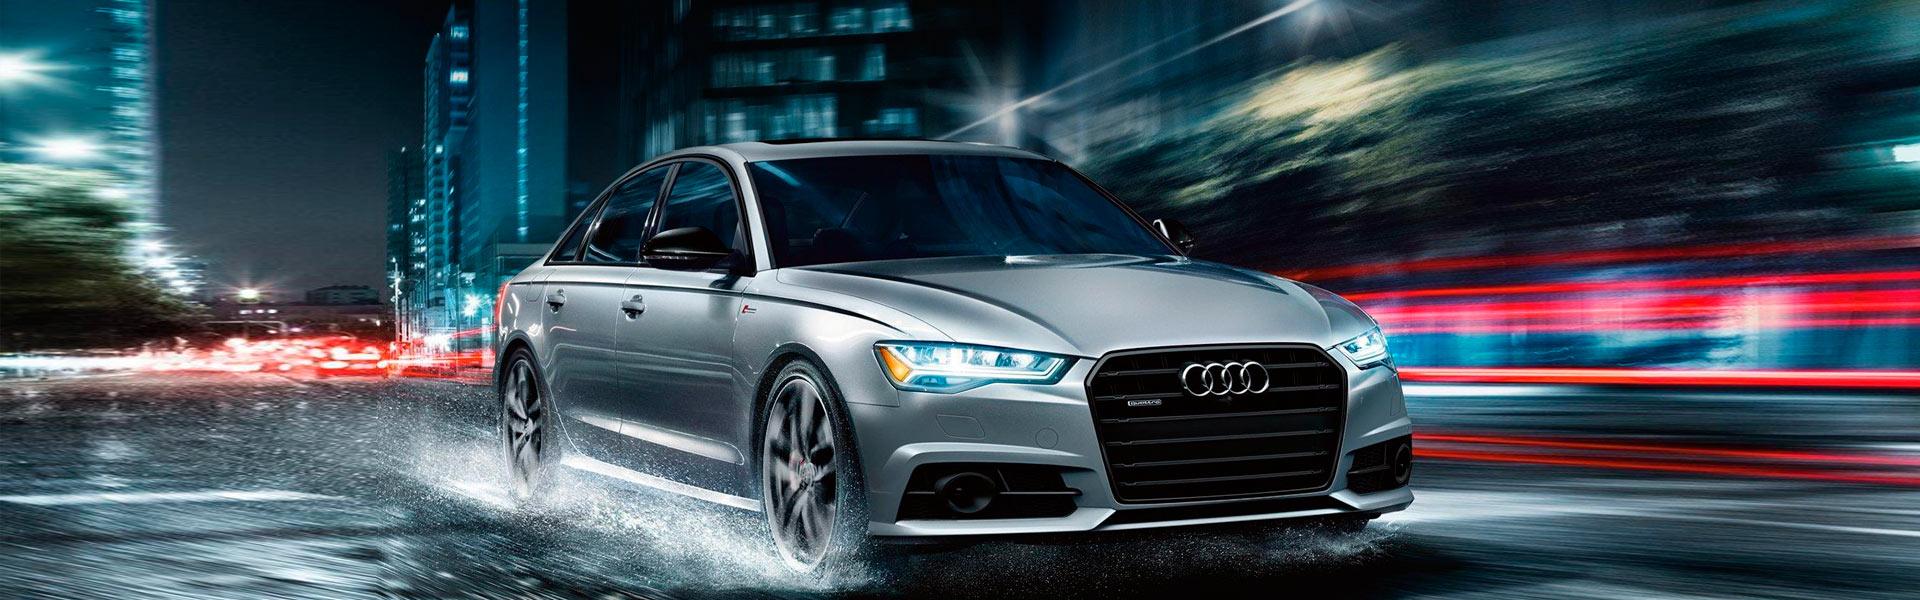 Запчасти на VAG Audi